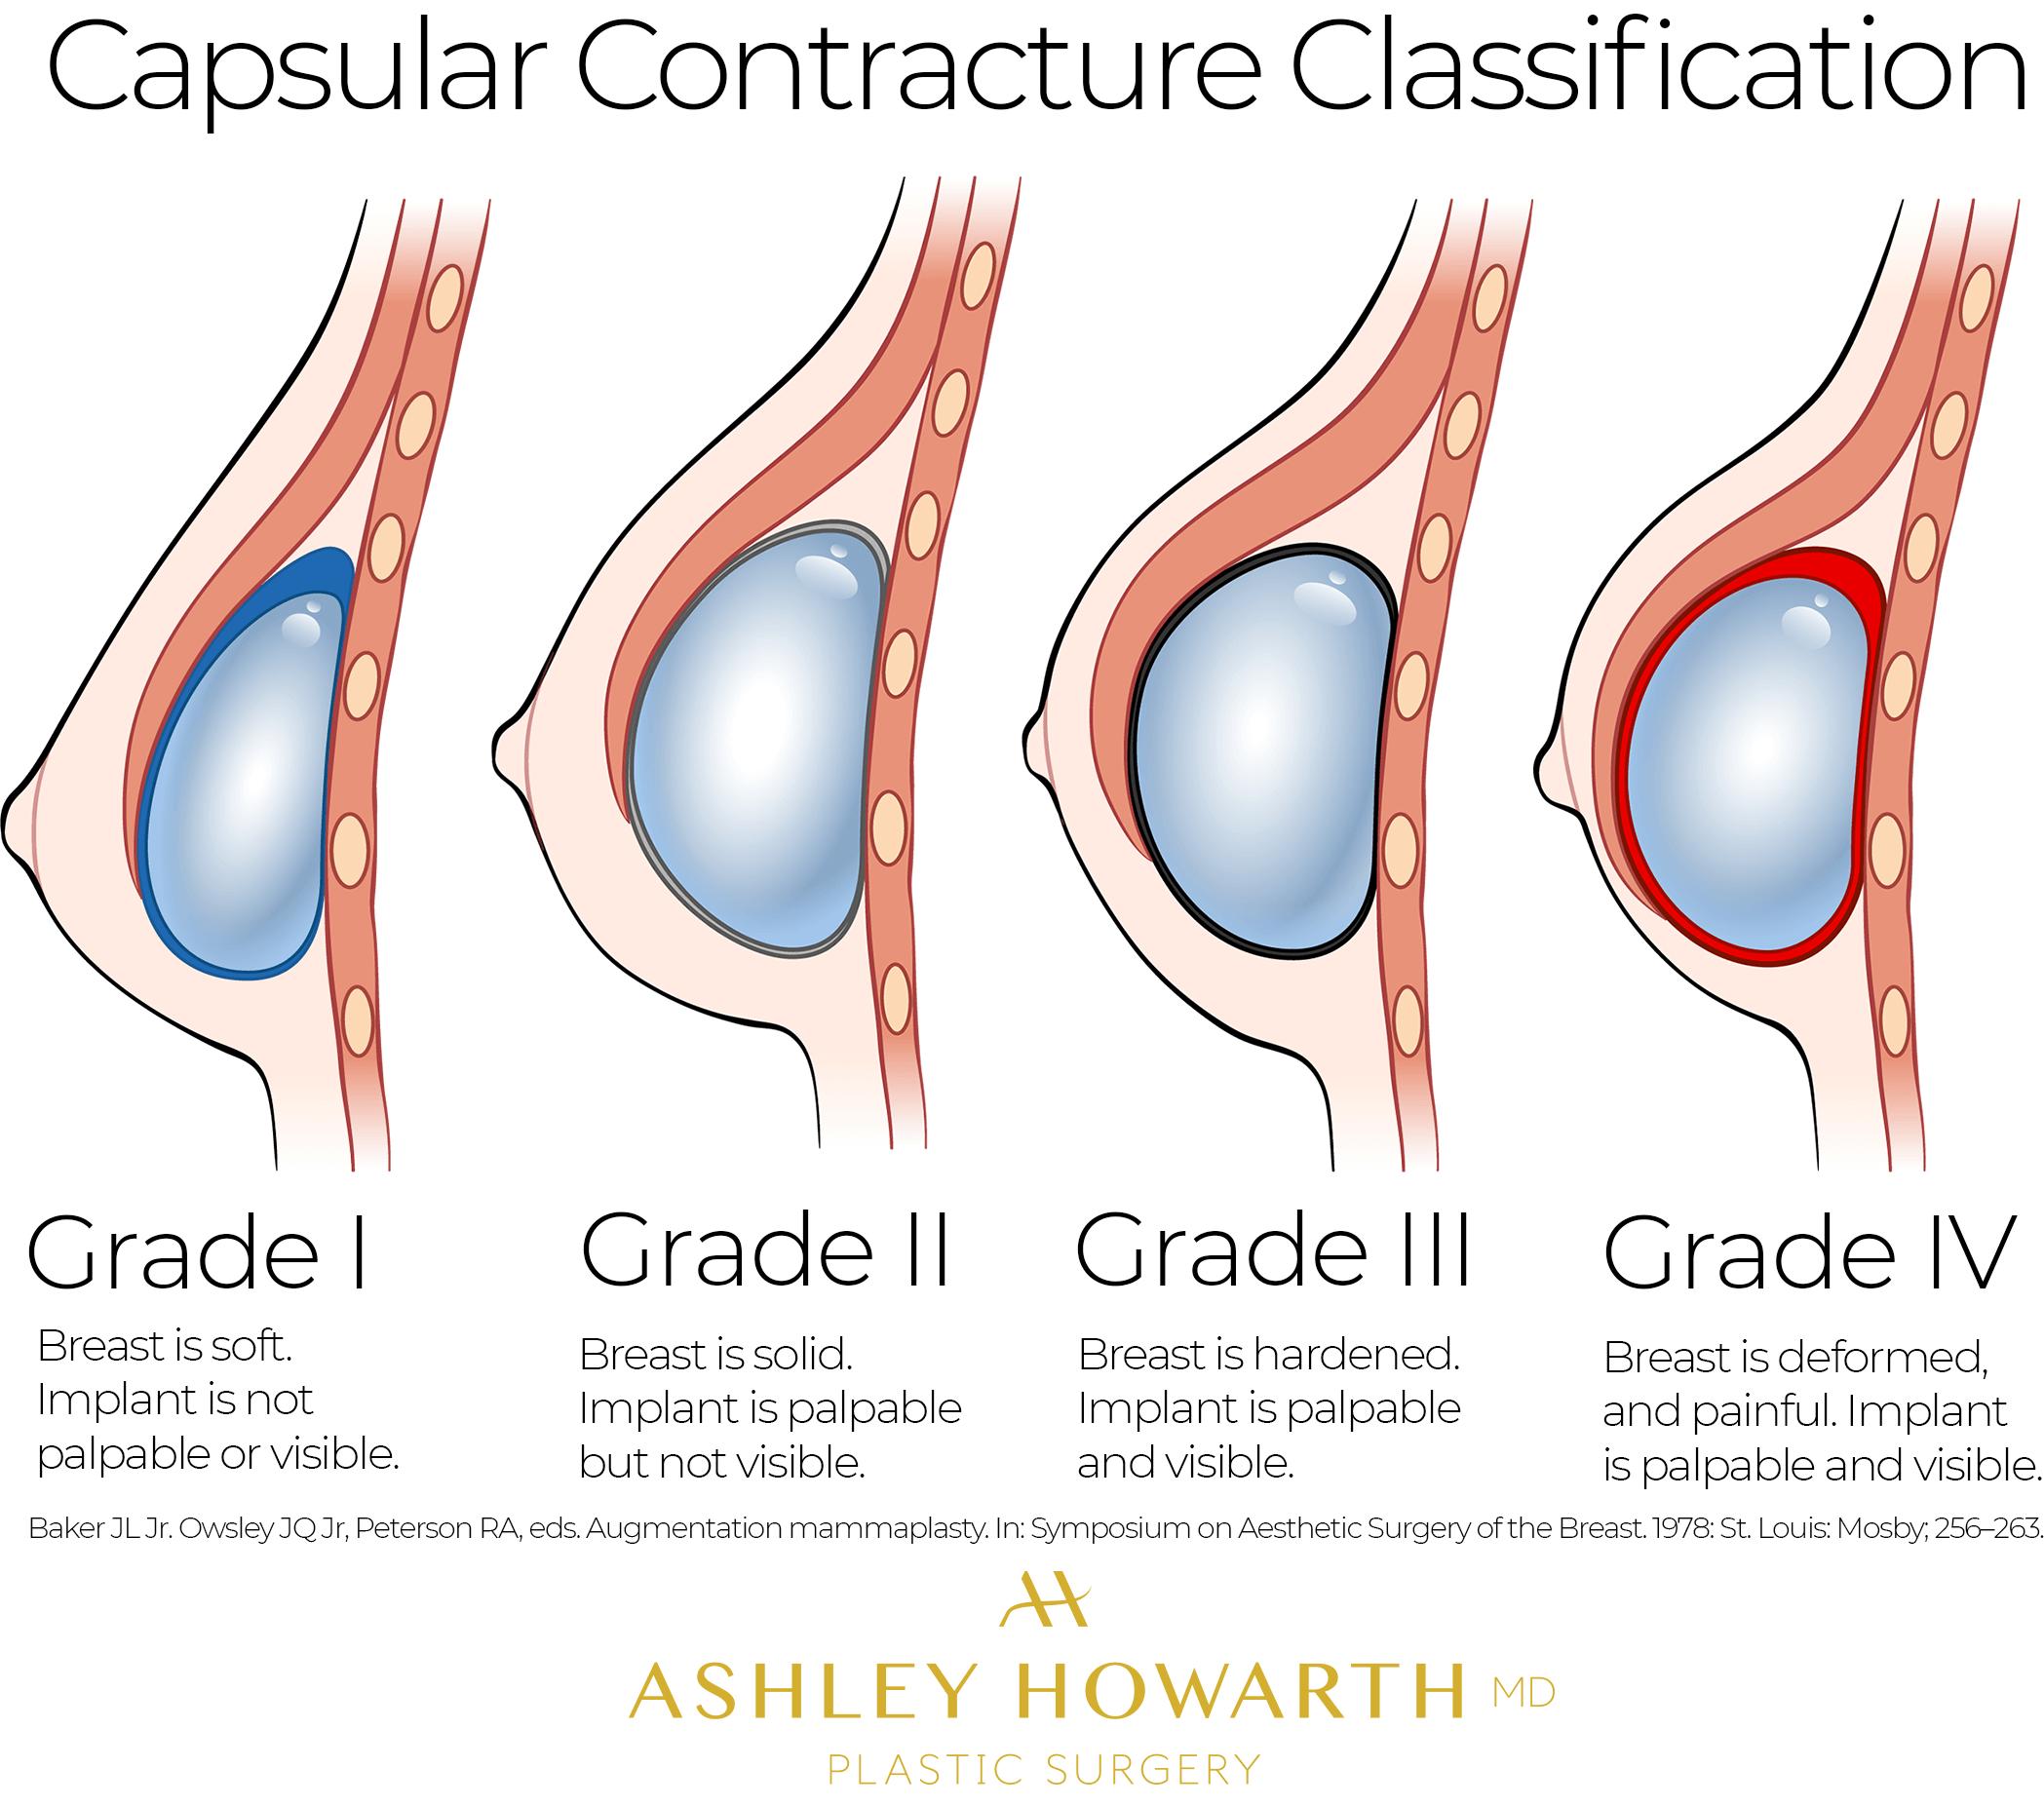 Baker Grades Capsular Contracture